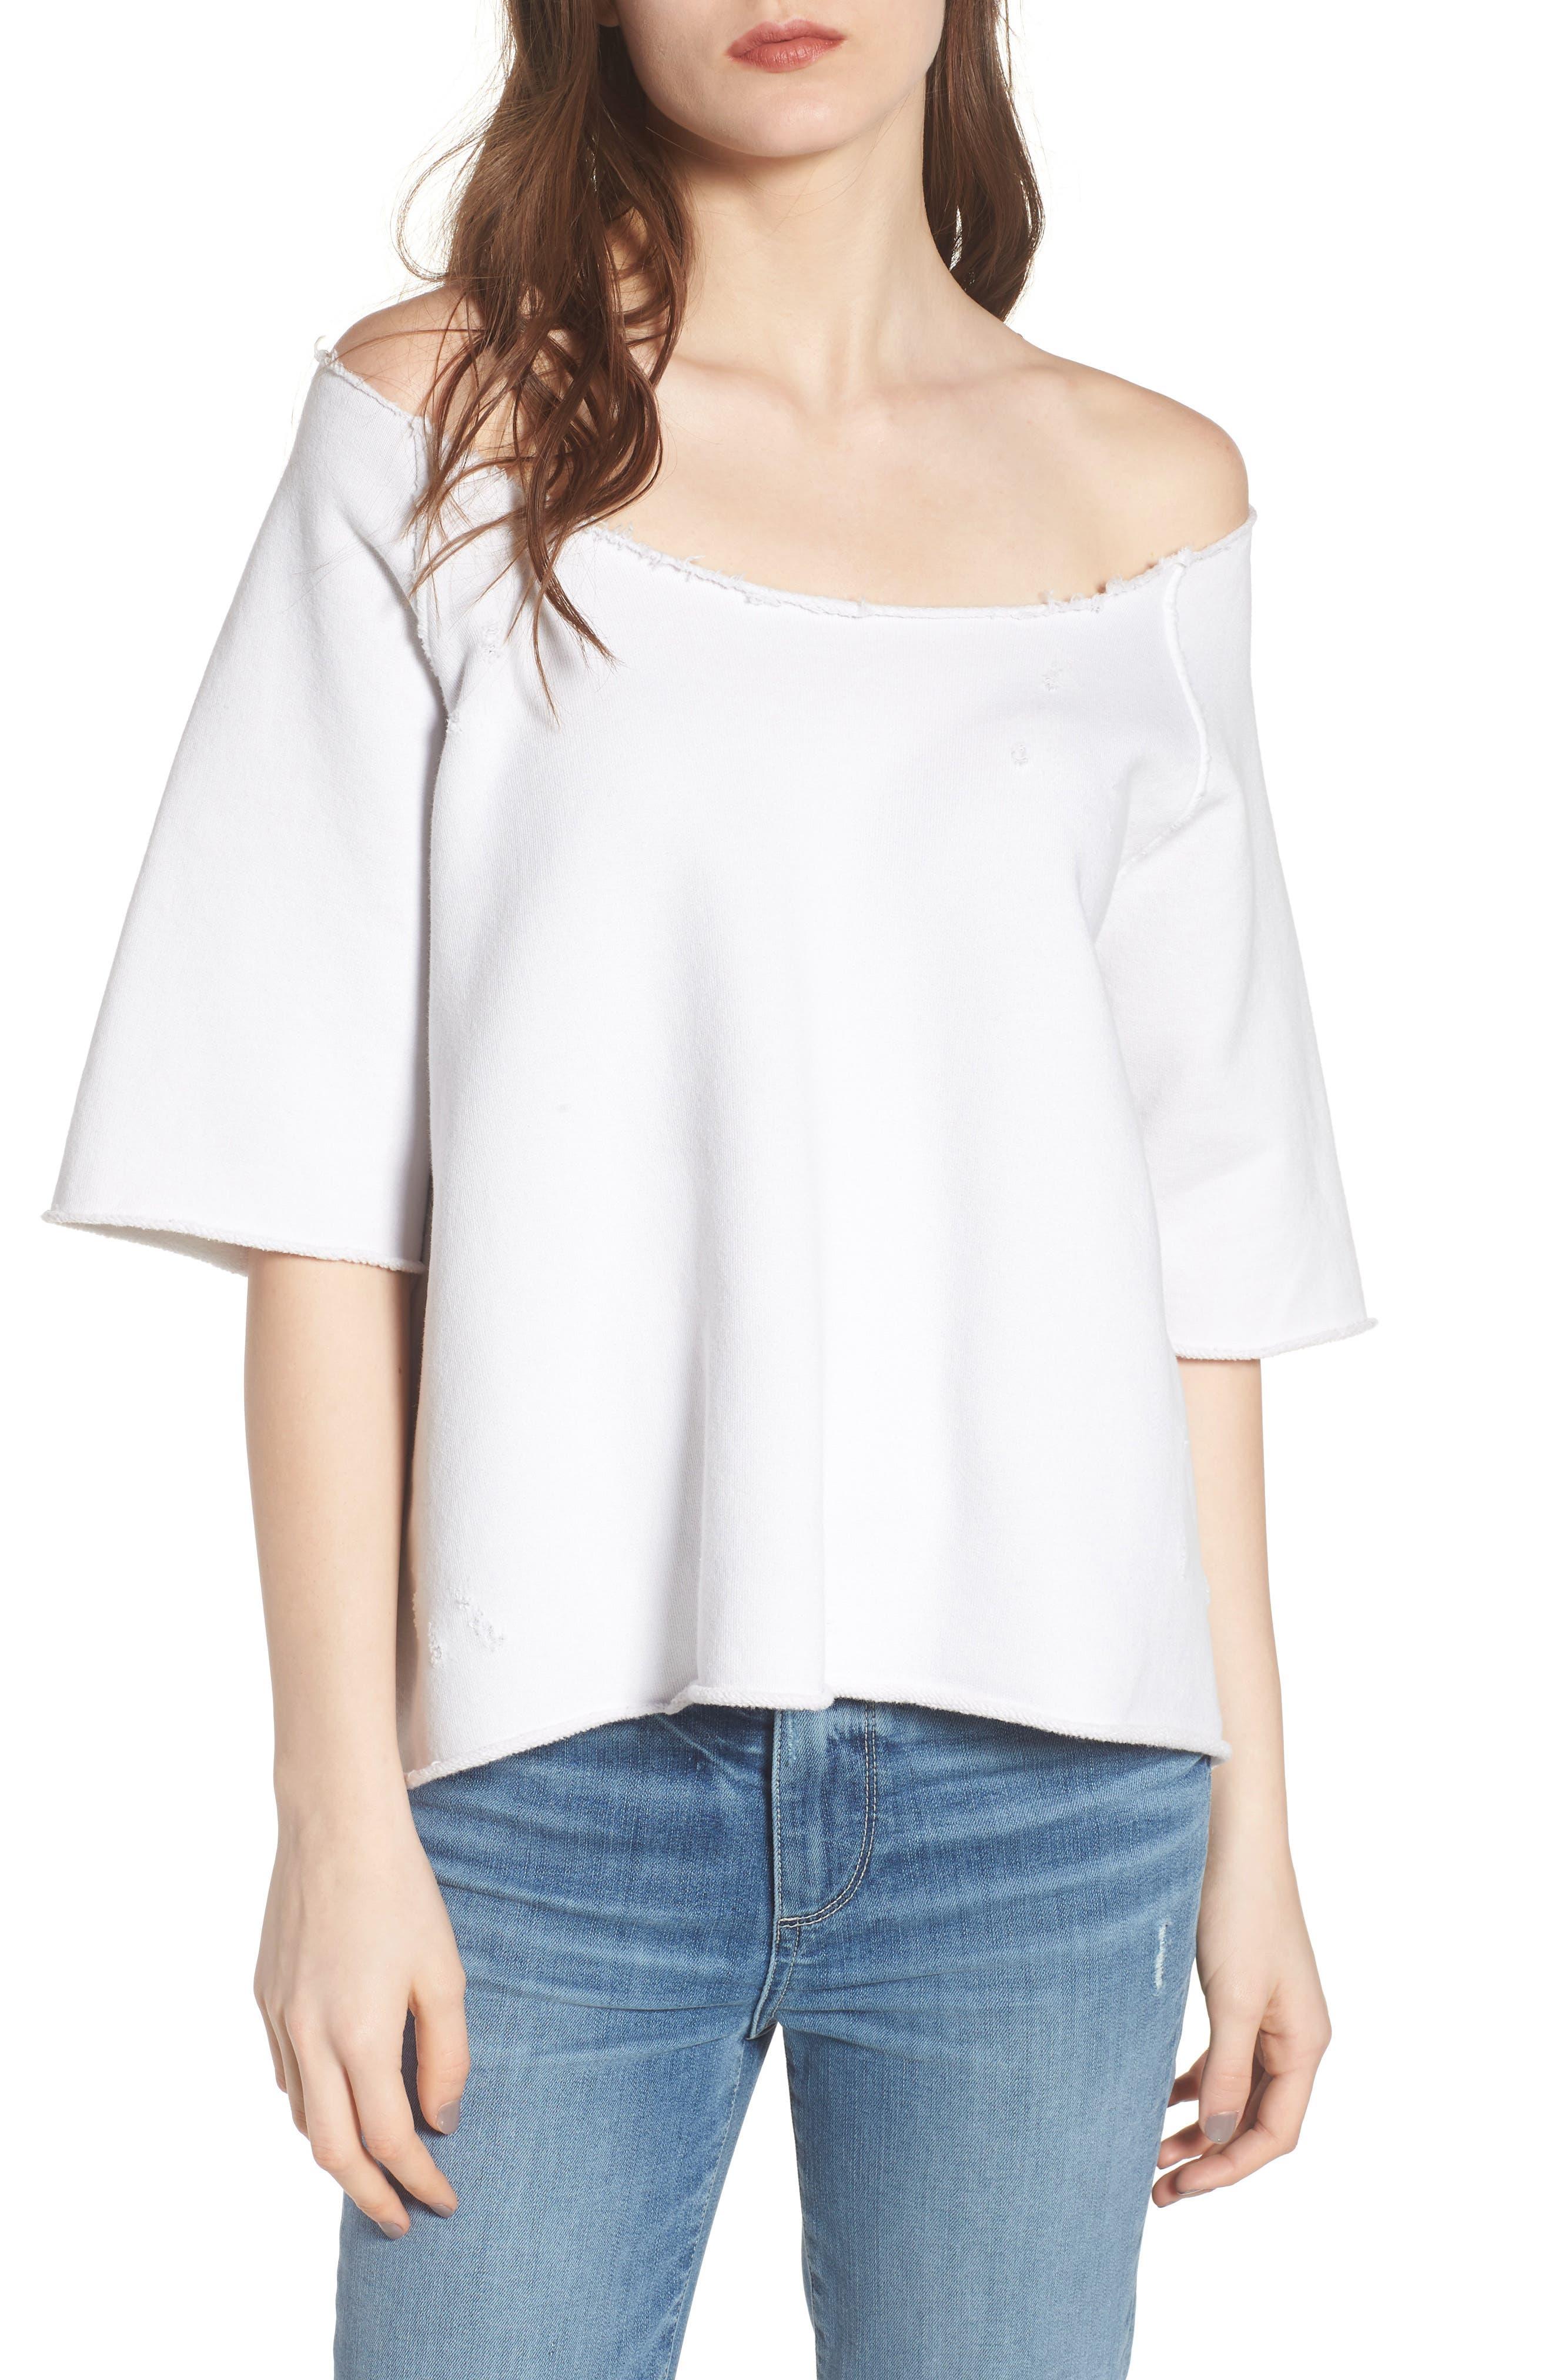 Raglan Off the Shoulder Sweatshirt,                         Main,                         color, Dirty White 10 Yr Vintage Wash